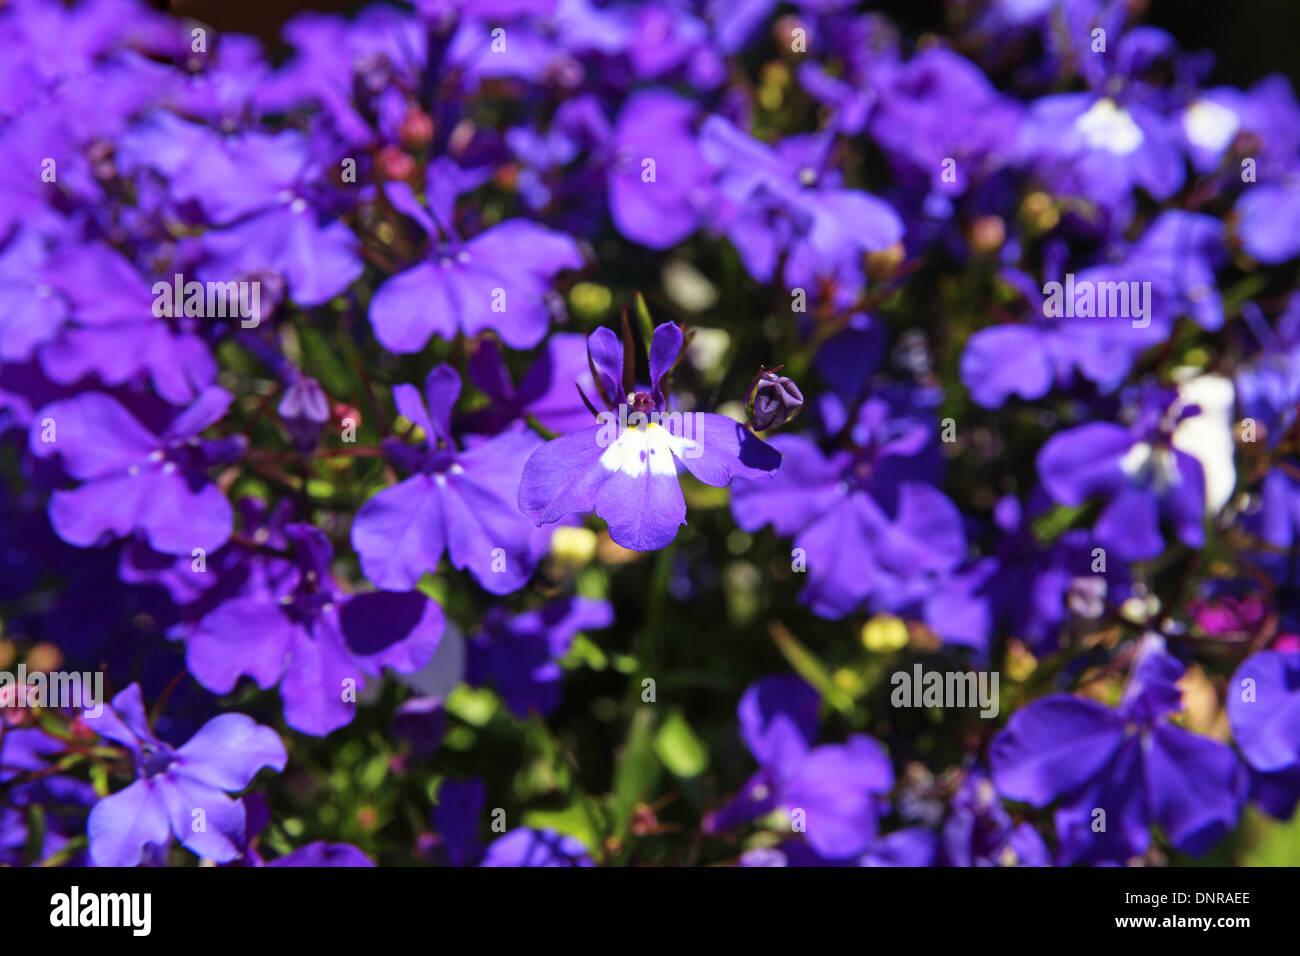 Lobelia Erinus Cultivar Mrs Clibran An Annual Summer Bedding